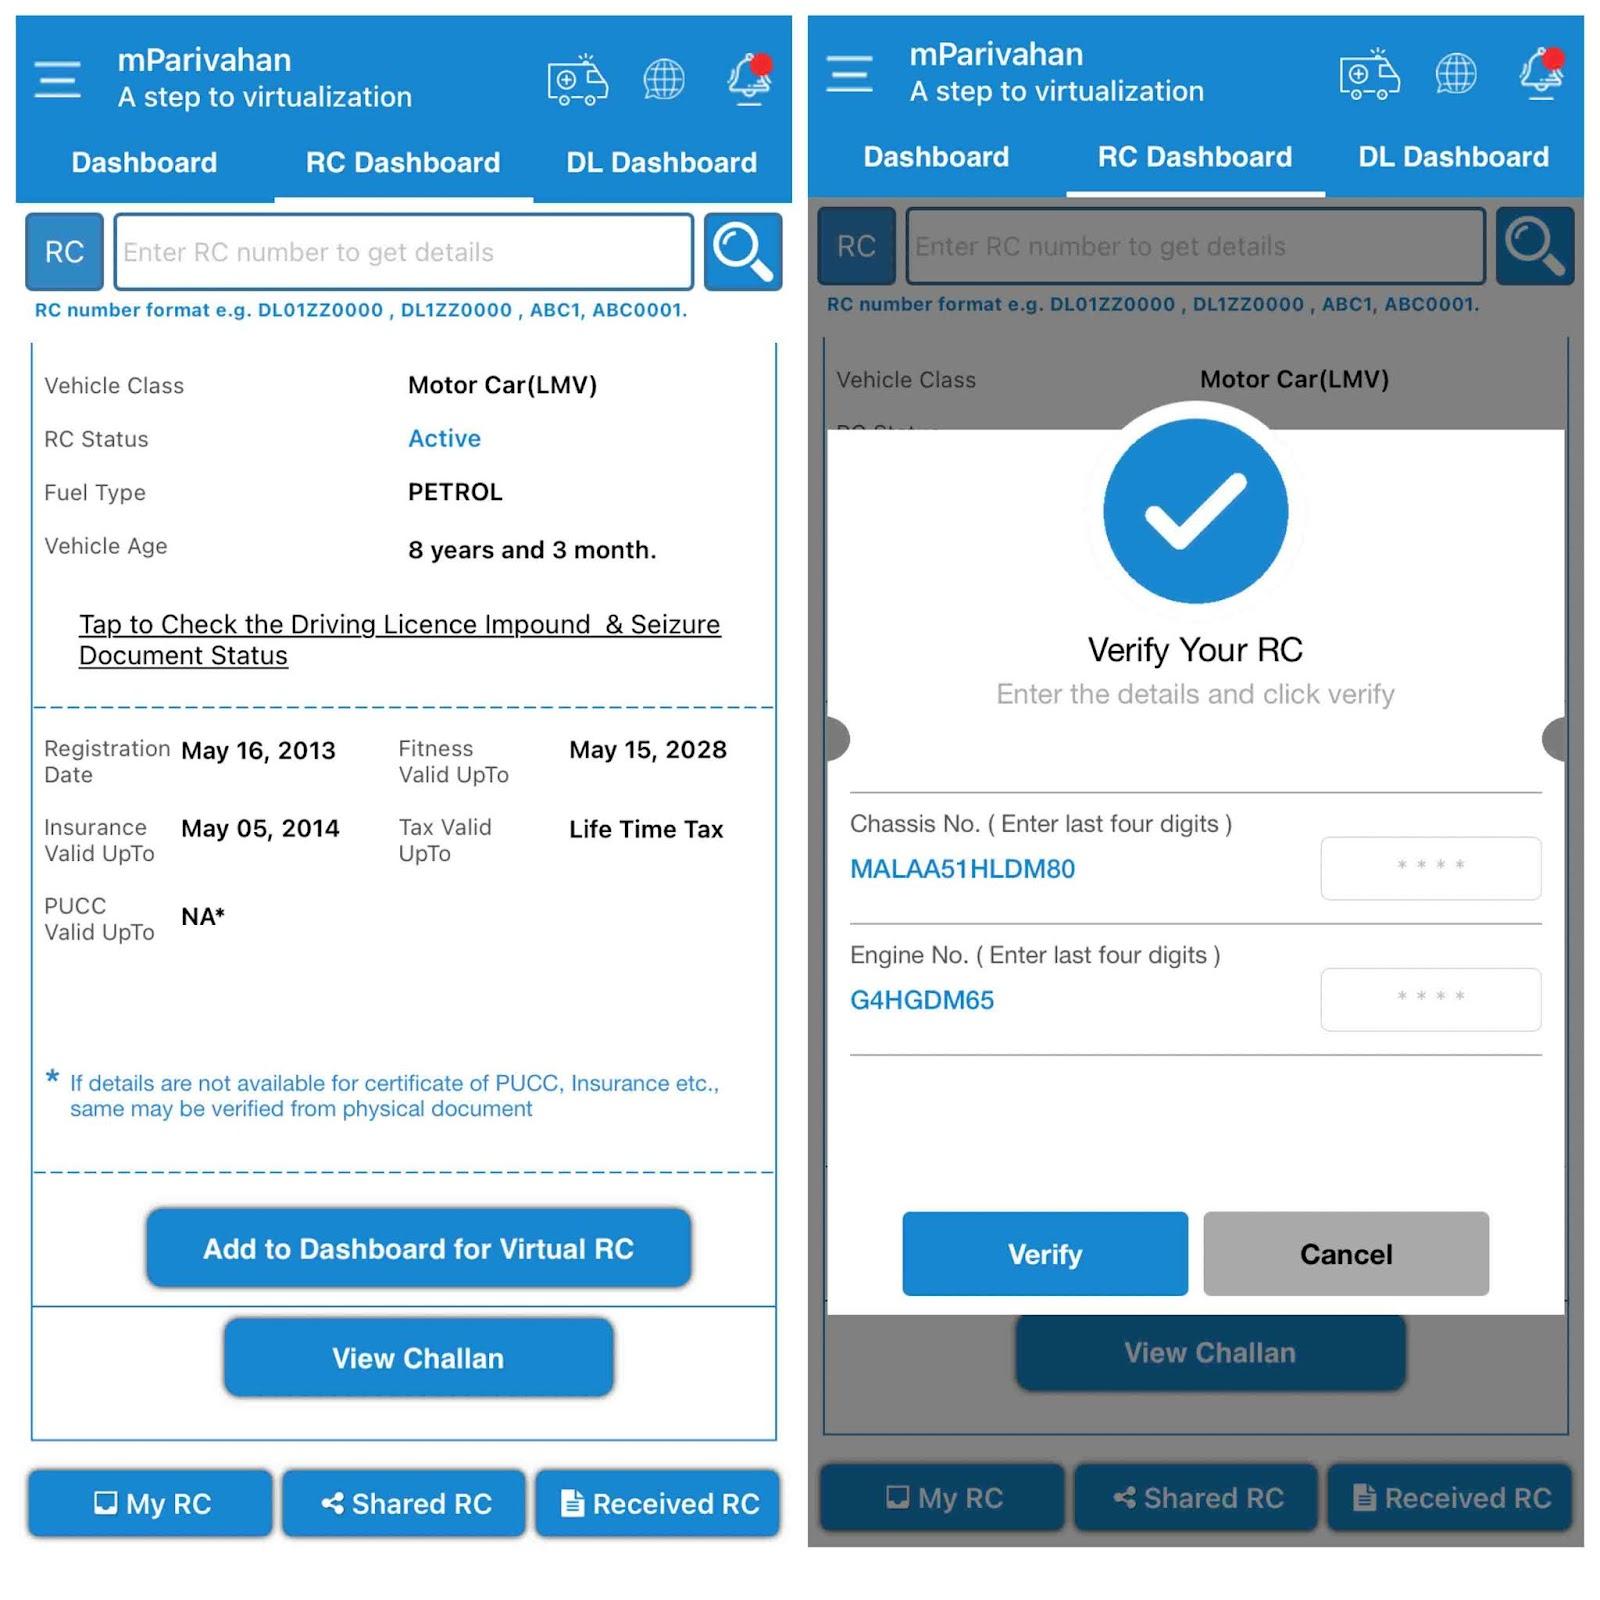 Add virtual RC to dashboard on mParivahan app